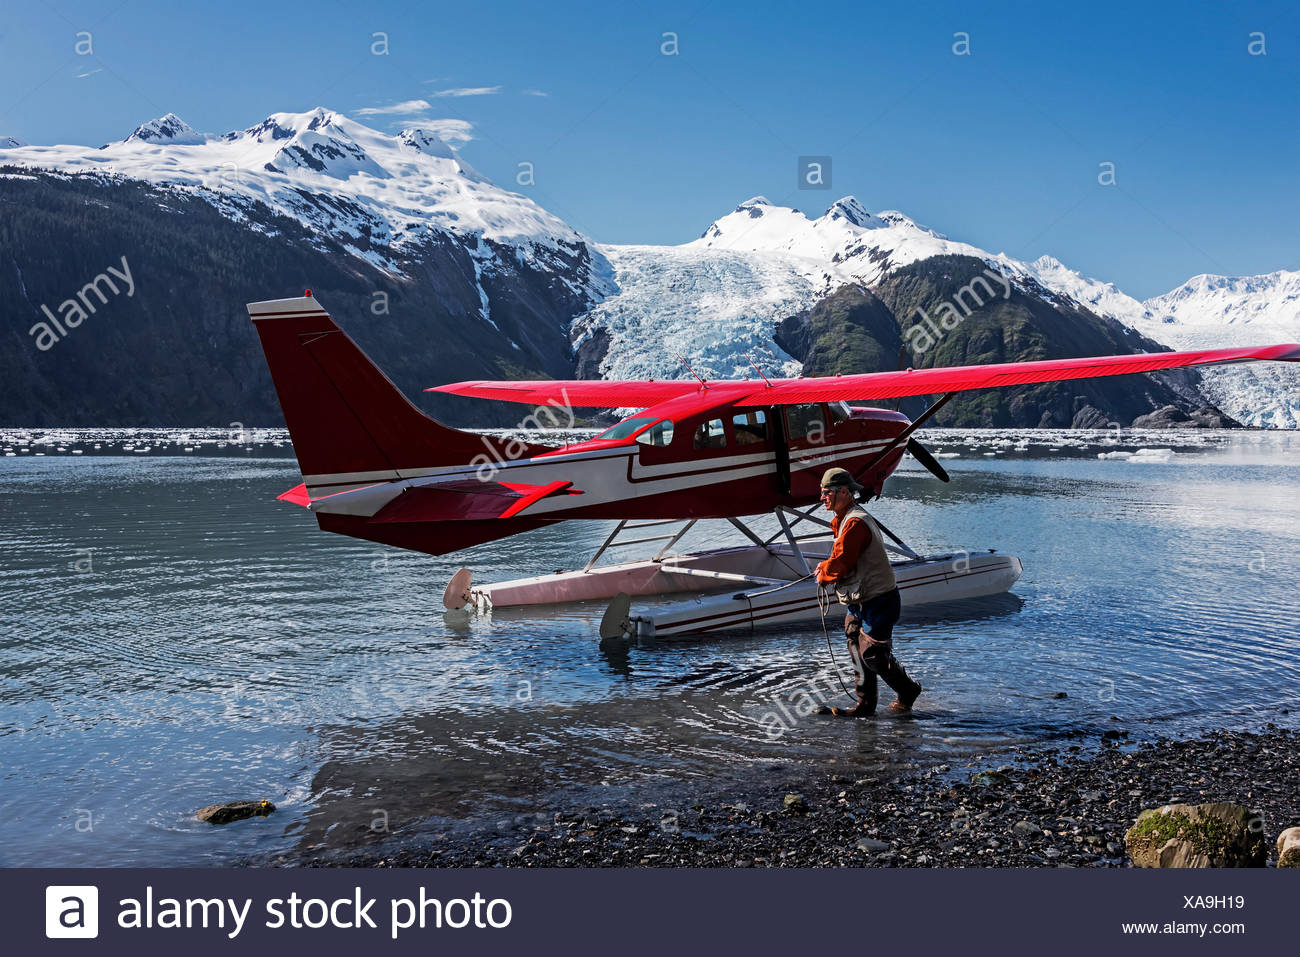 Pilot maneuvers a Cessna 206 floatplane